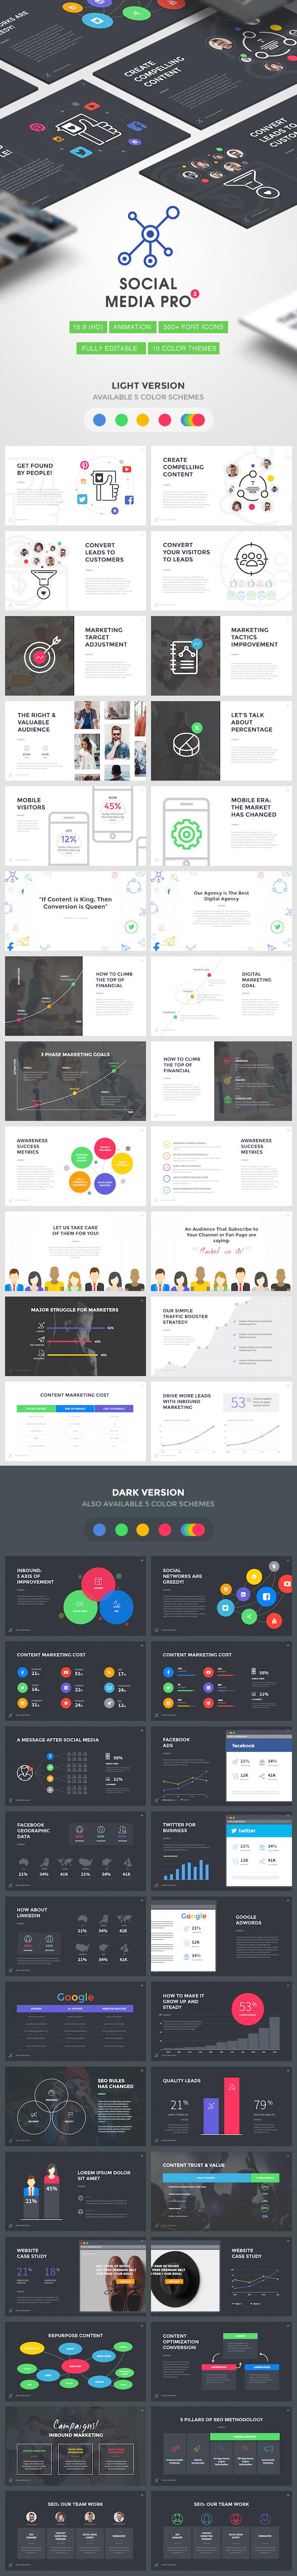 Social Media PRO 2 - Marketing Keynote Template - Keynote Templates Presentation Templates